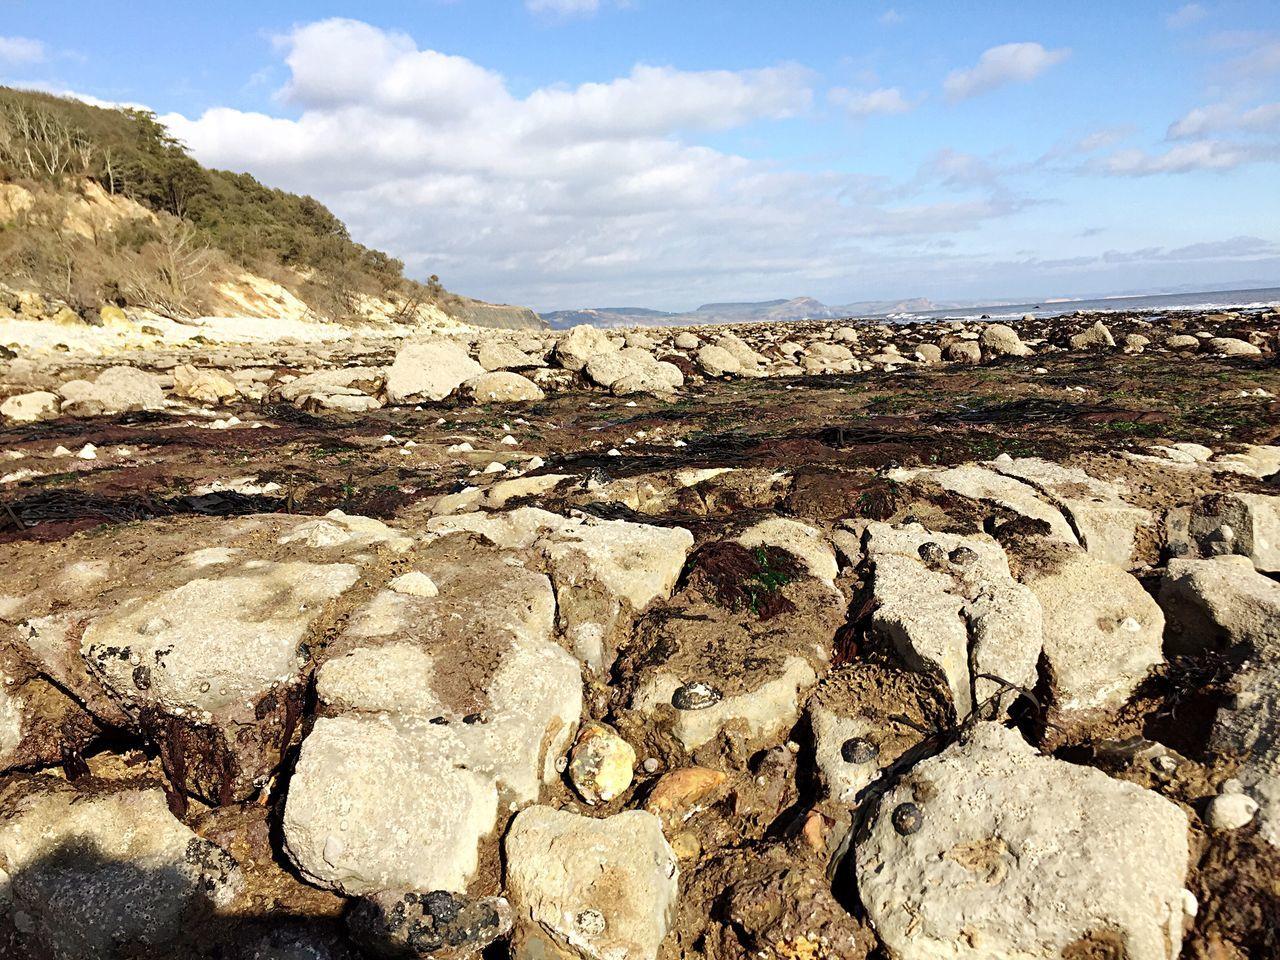 Beach Level near Lyme Regis March Fossil Coast Coastline Devon Strata  Rock Layers Cliffs Pebbles Sun Sea Jurrasic Coast Sea Level